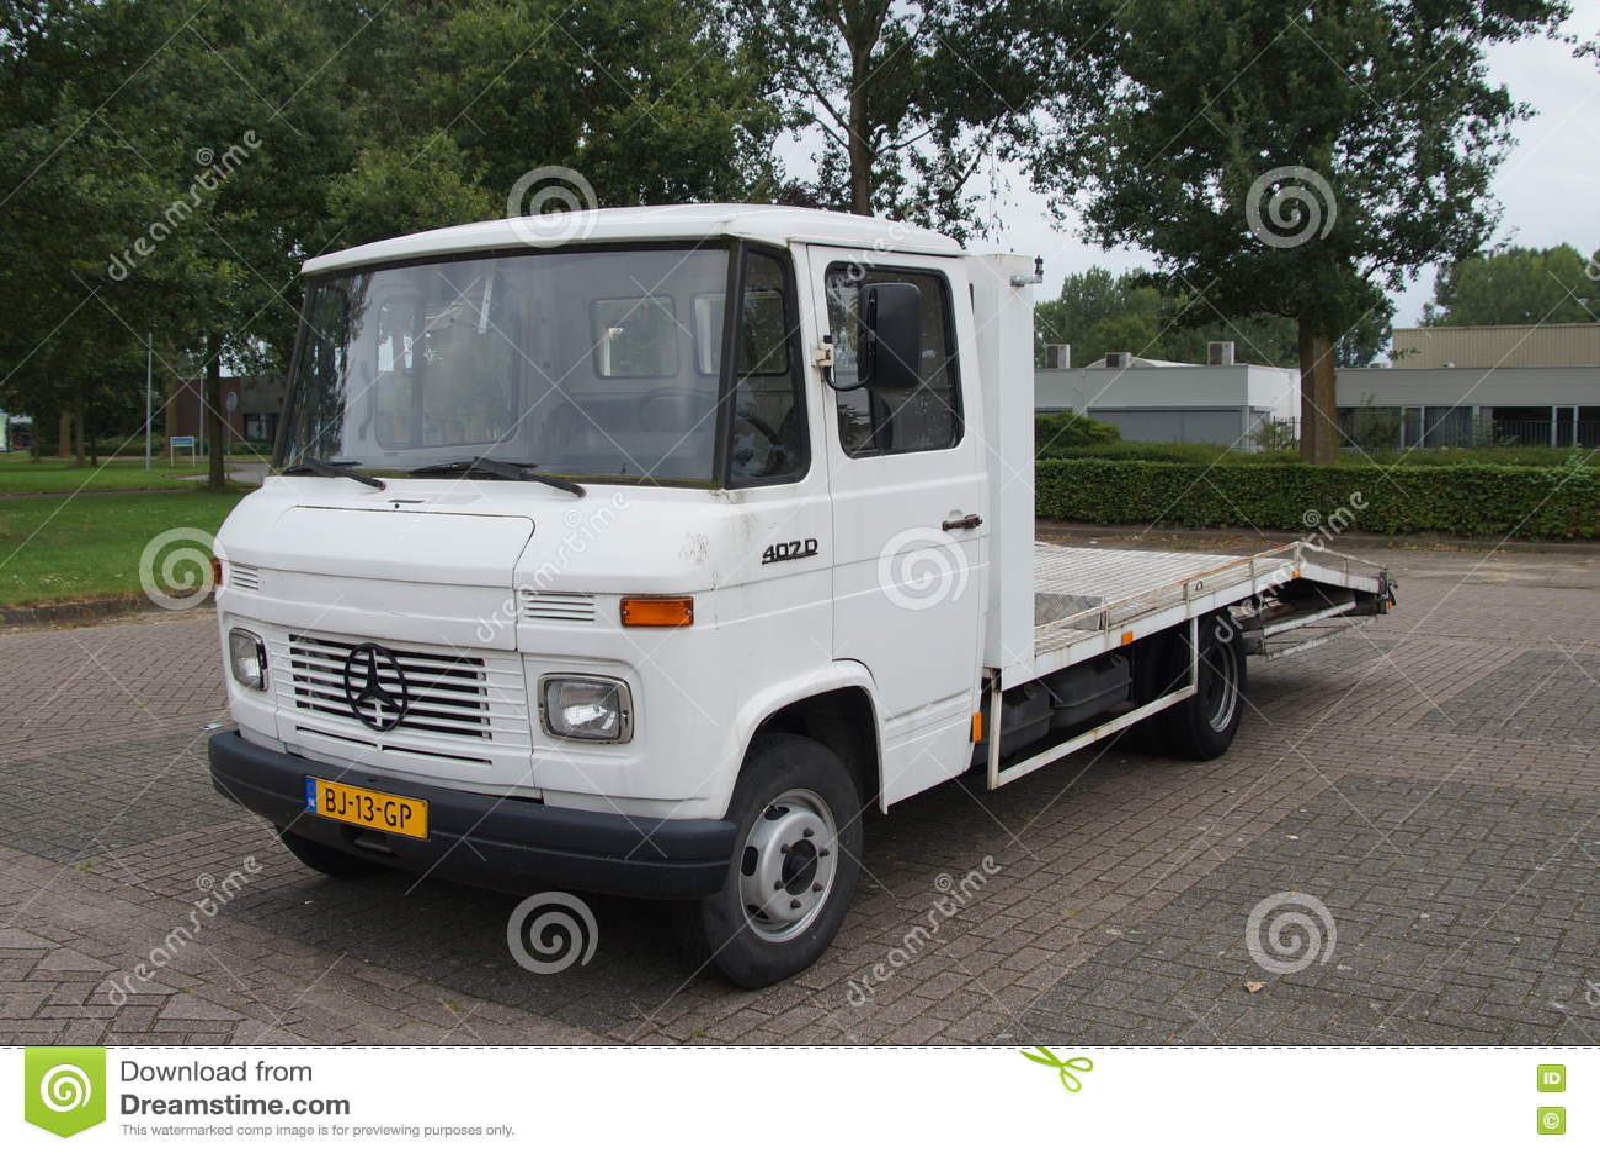 White mercedes benz l 407 d car trailer truck editorial for Mercedes benz parking